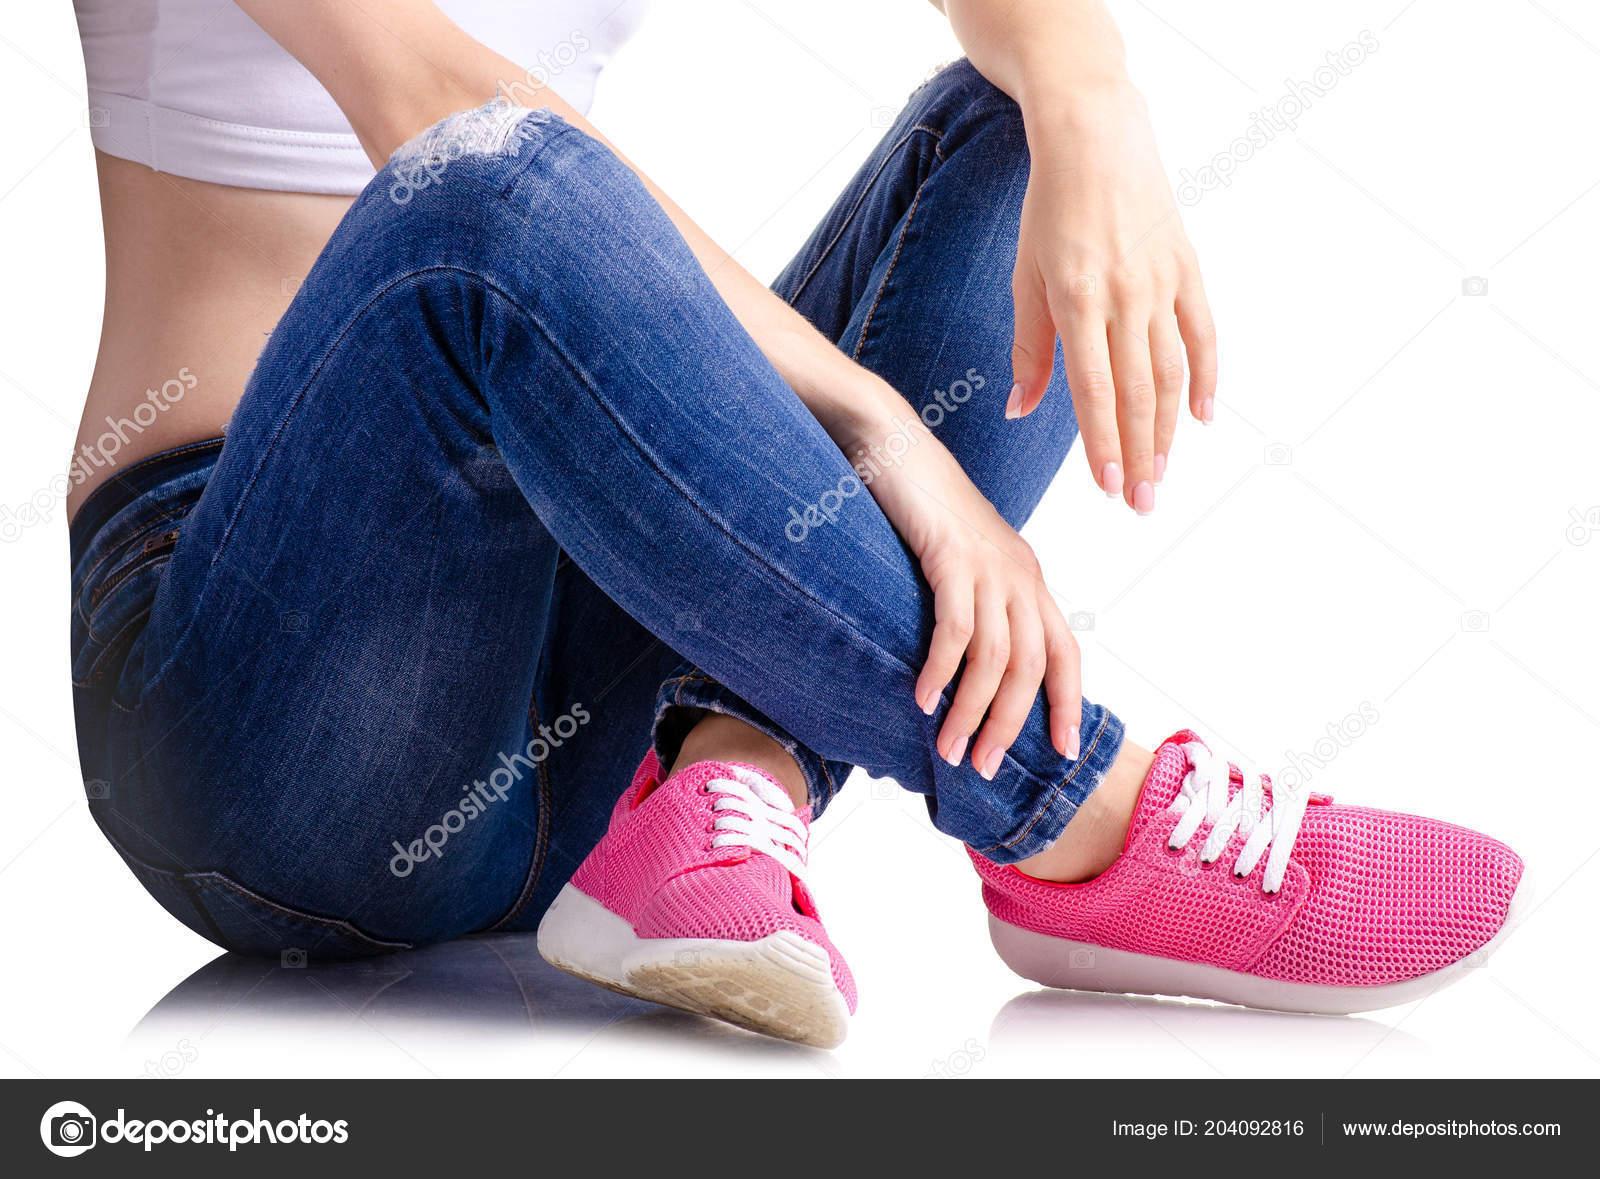 low priced aad81 bf0fe depositphotos 204092816-stock-photo-woman-denim-sneakers.jpg